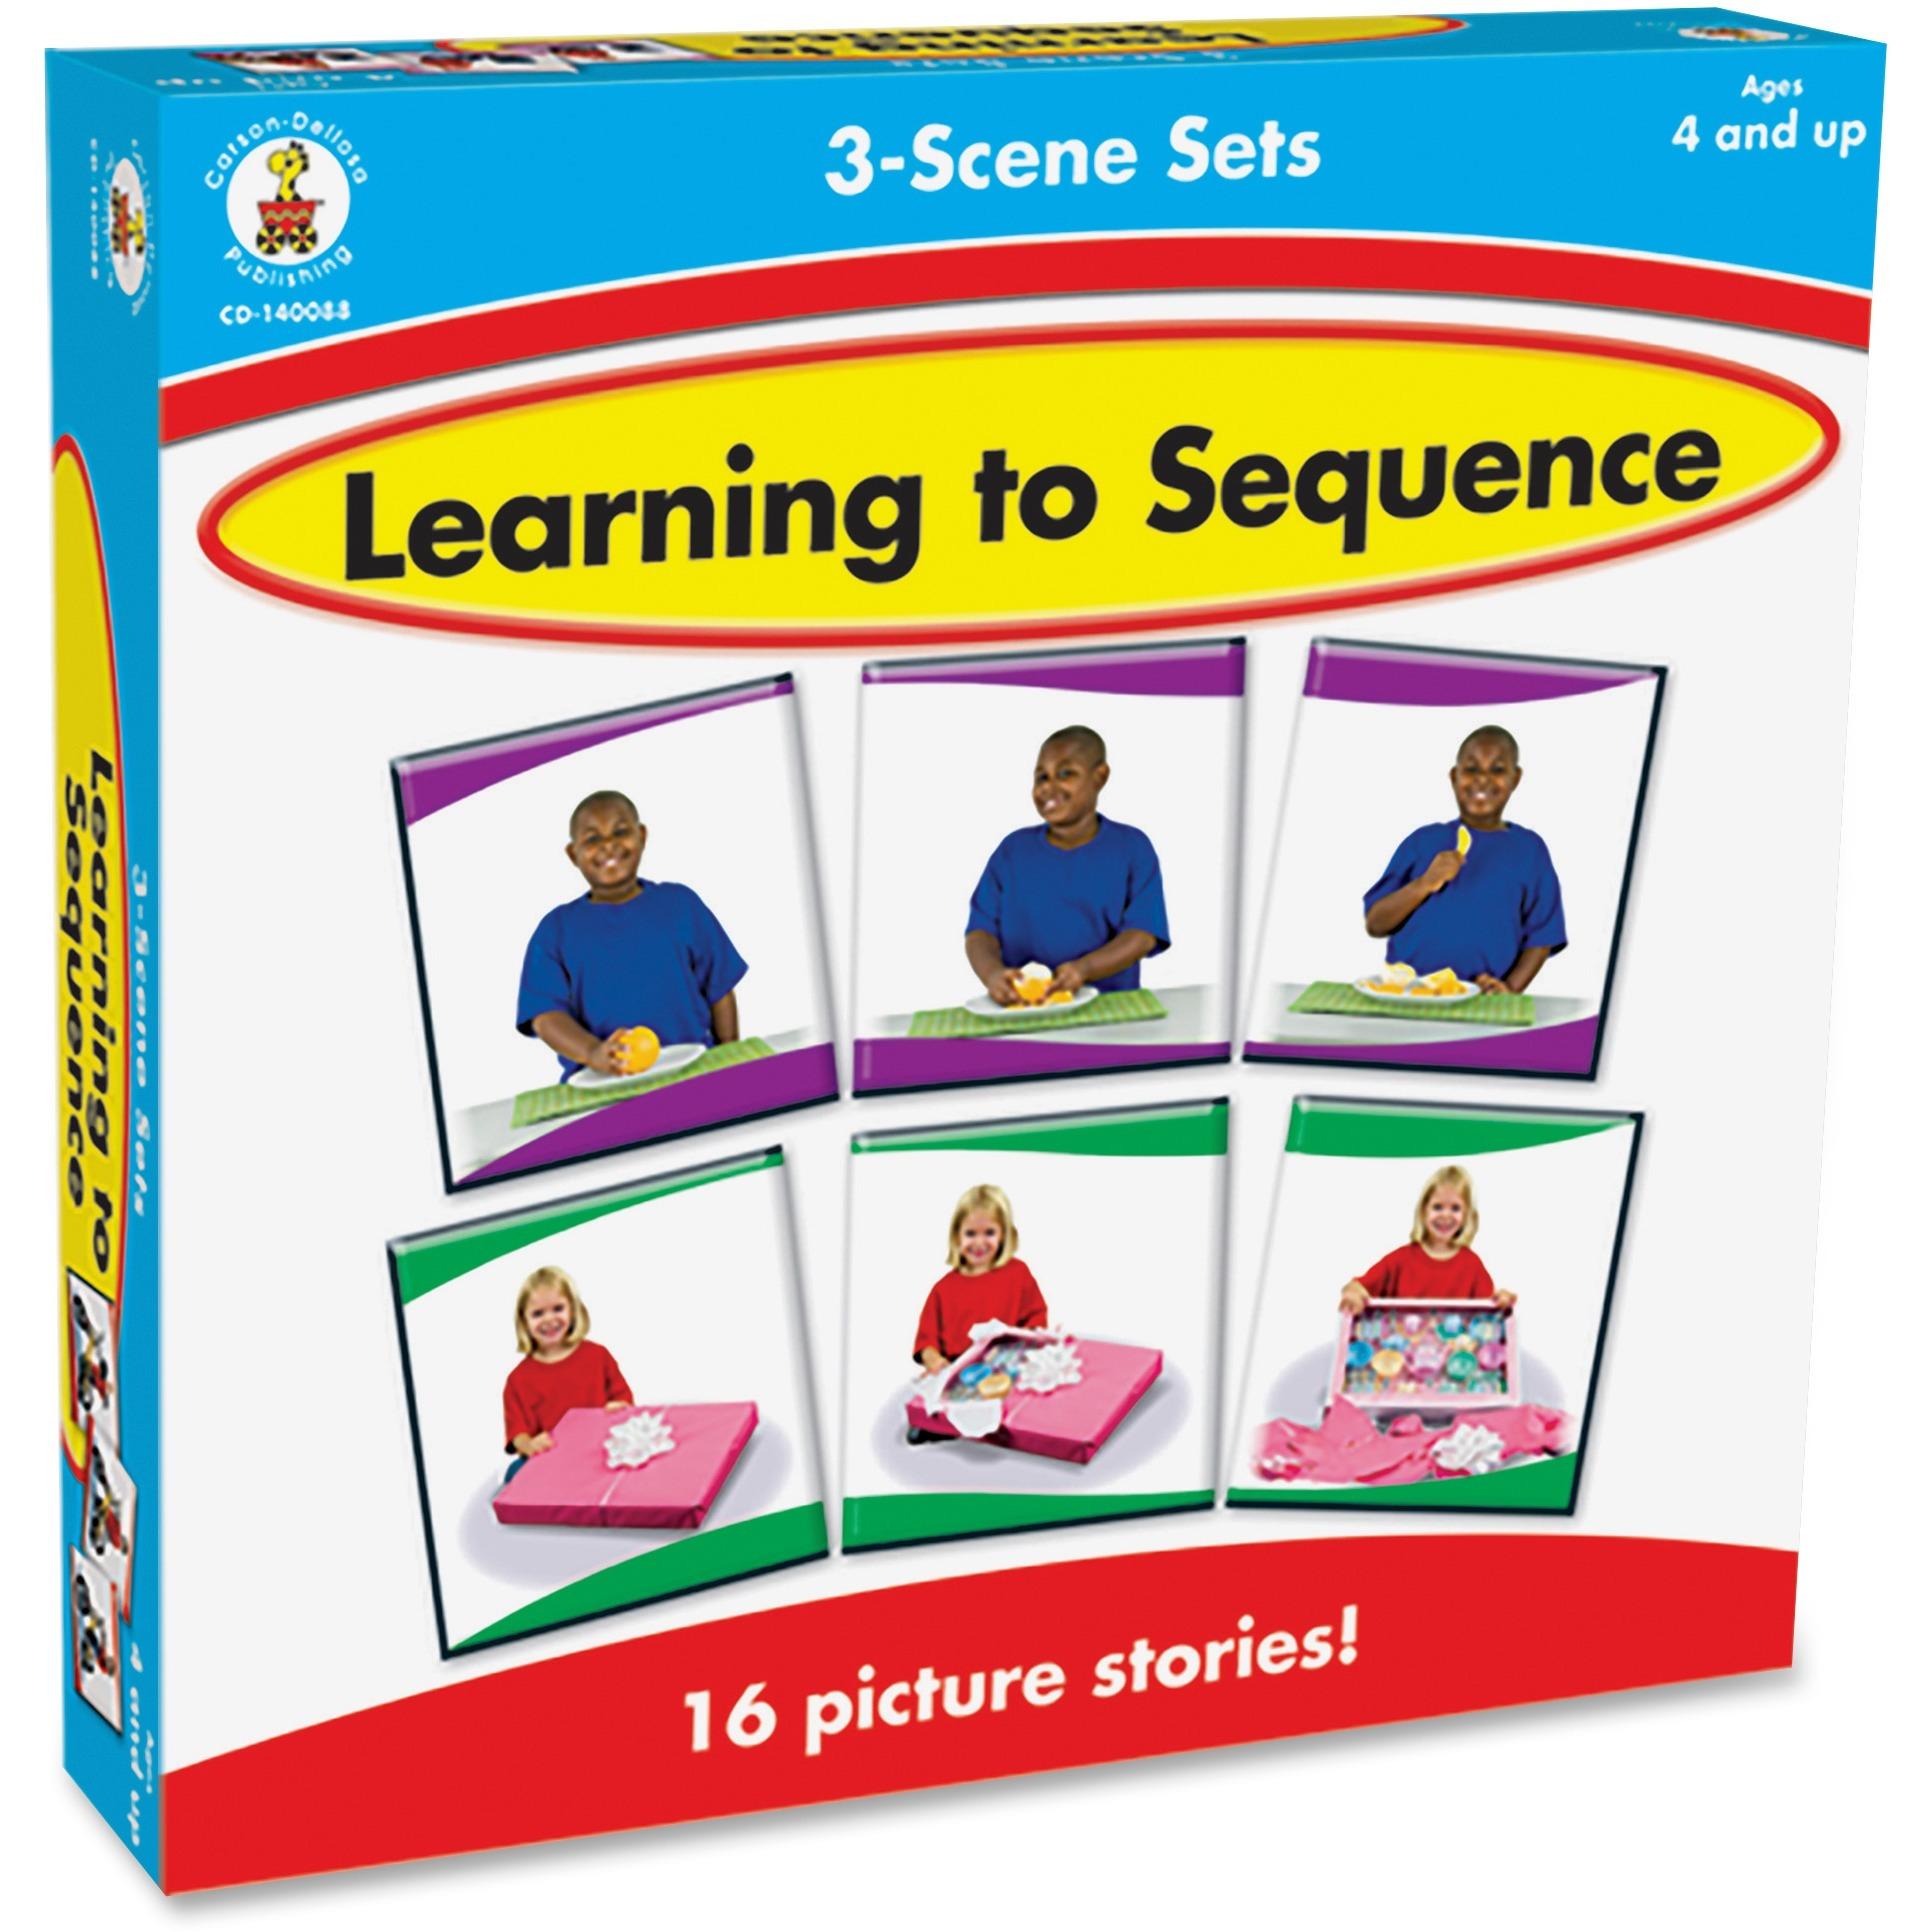 Carson-Dellosa, CDP140088, Learning To Sequence 3-scene Board Game, 1 Each, Multi